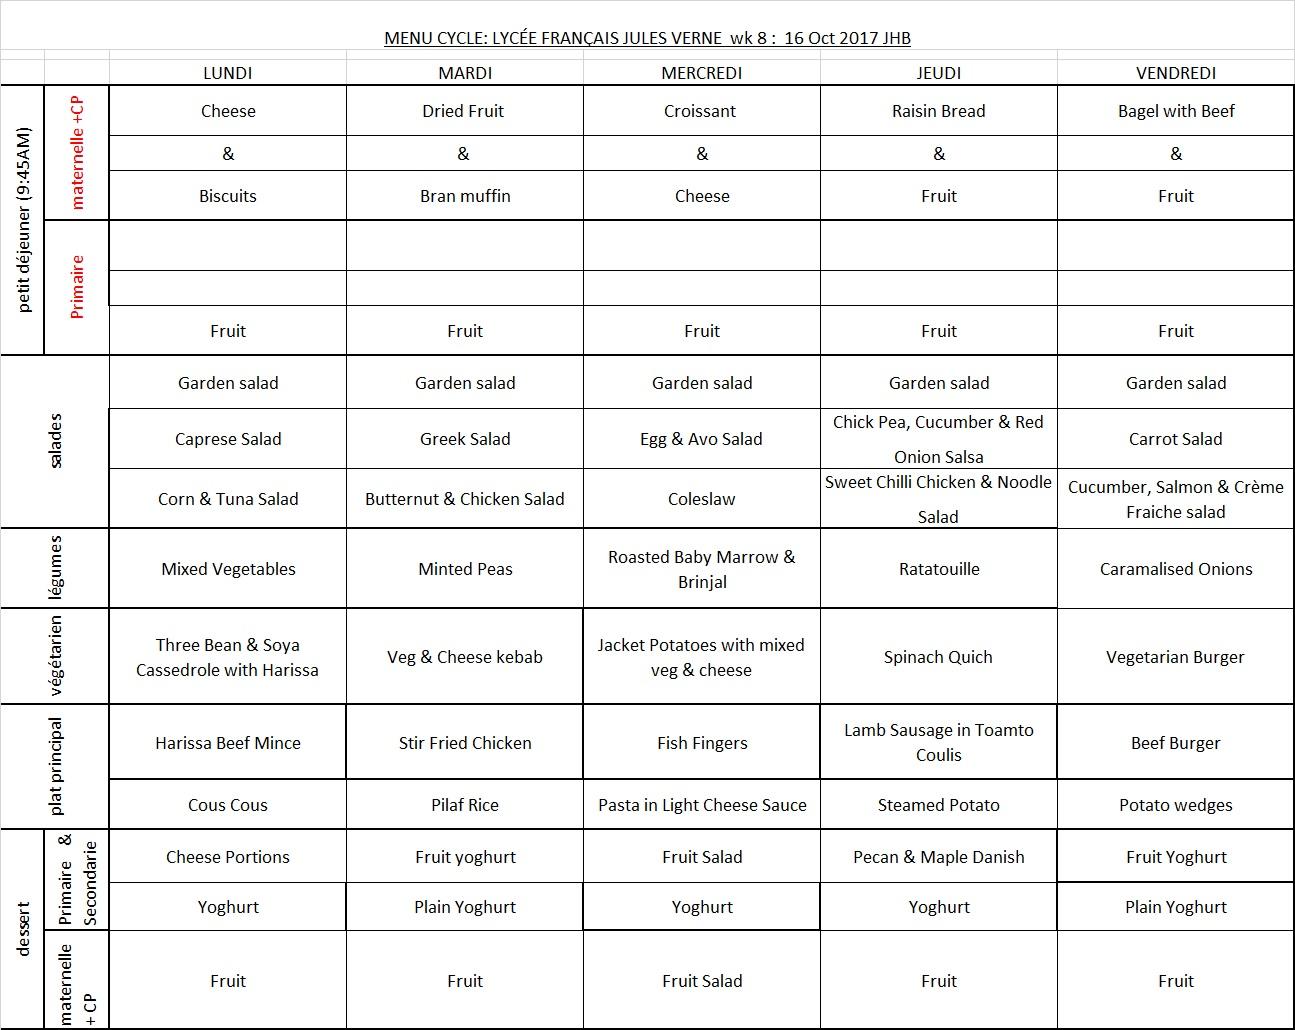 Menu JHB WEEK 8 - 16TH OCT